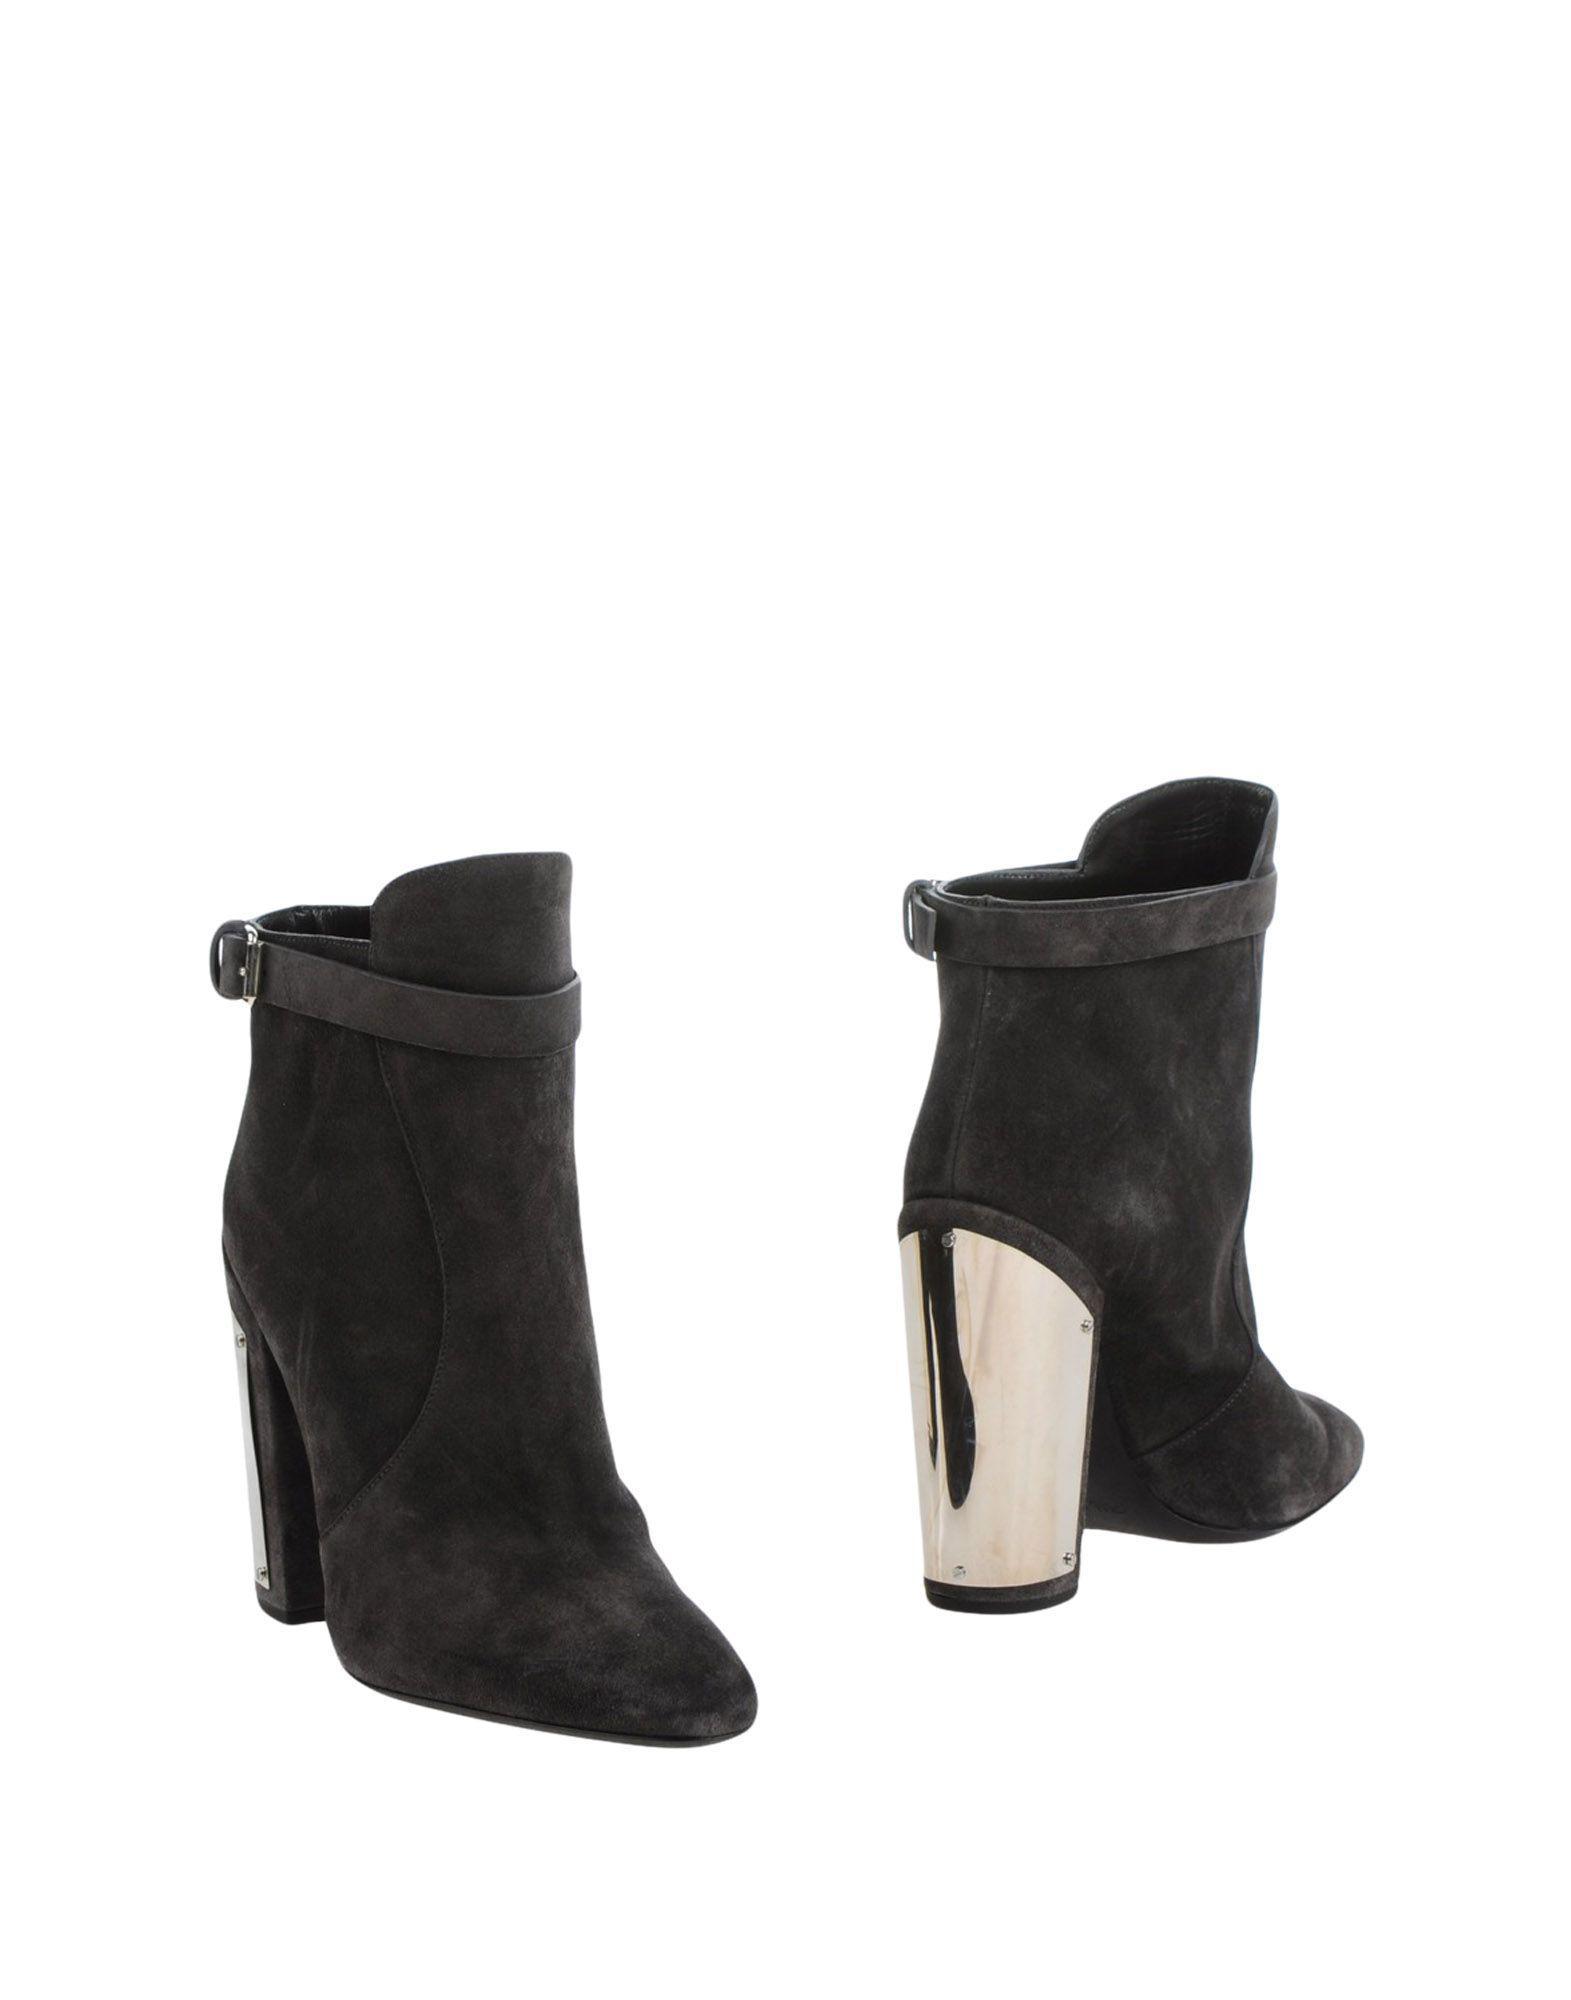 Giambattista Valli Patent Leather Ankle Boots l4Hsl2Qkvp